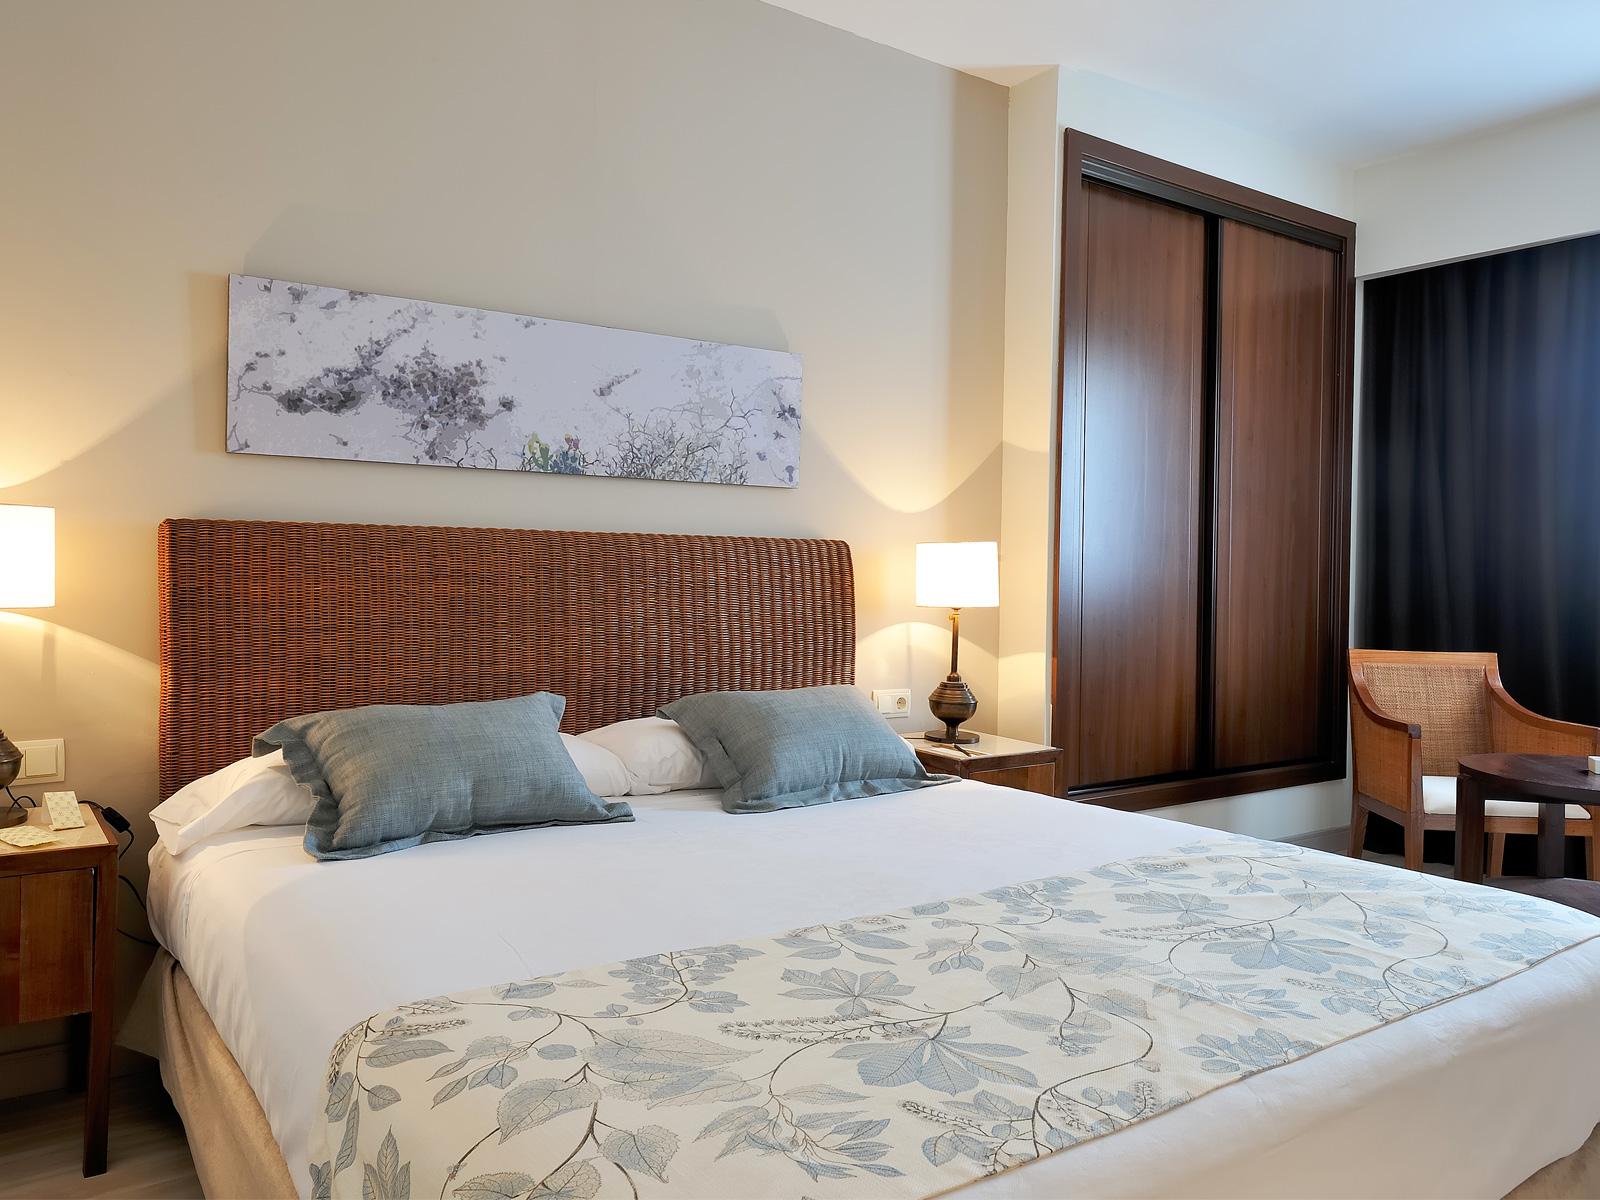 Rooms-Hotel Cádiz Costa Golf - Vincci Hotels